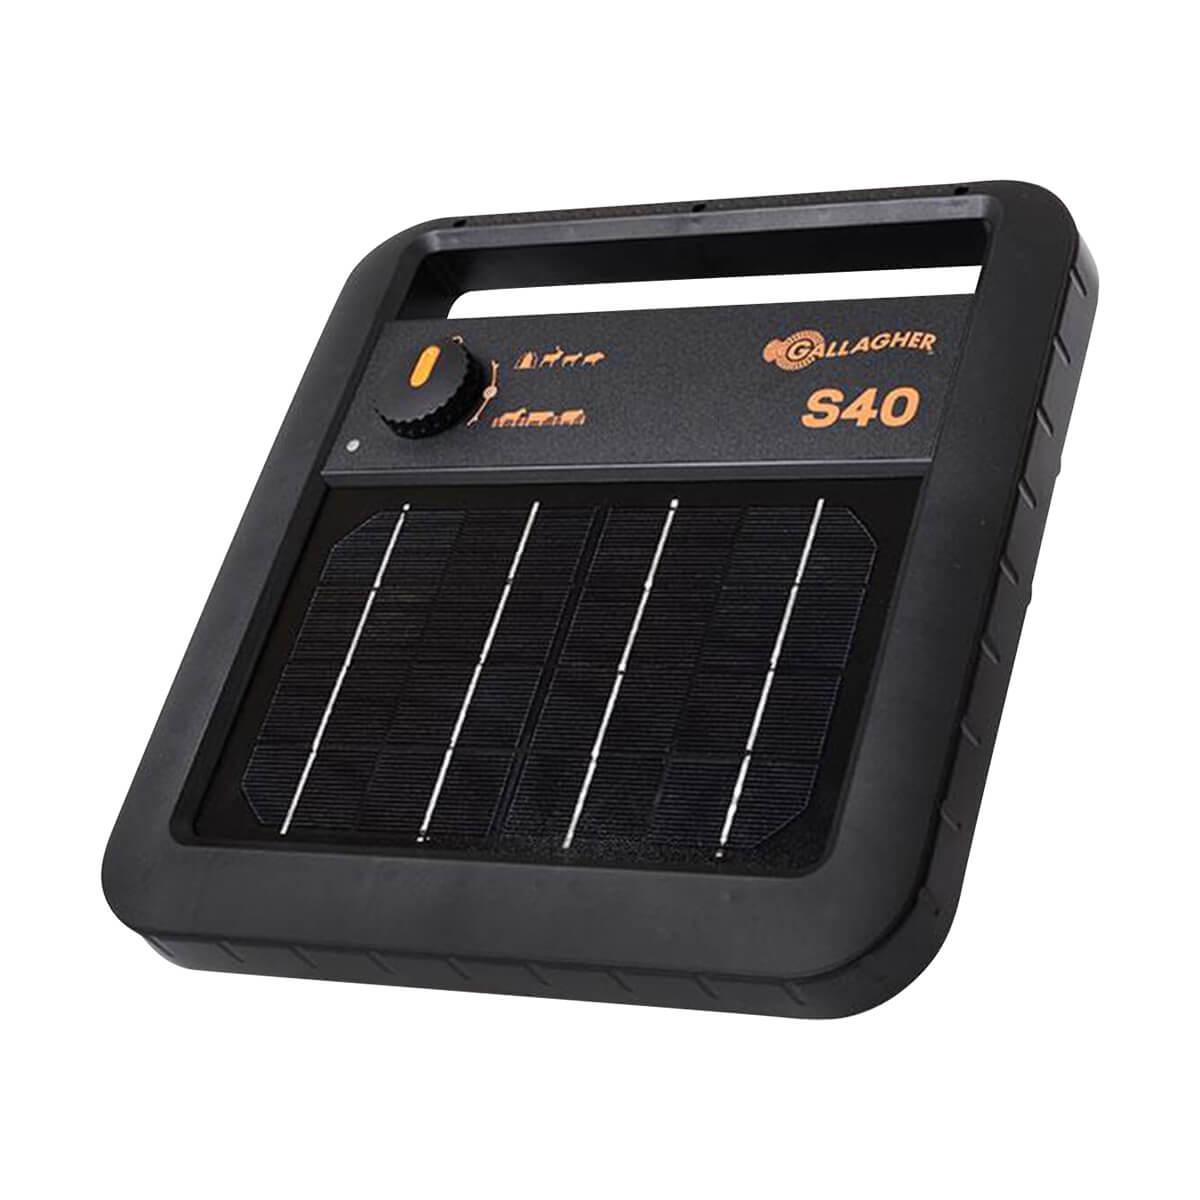 Gallagher Solar Fence Energizer S40